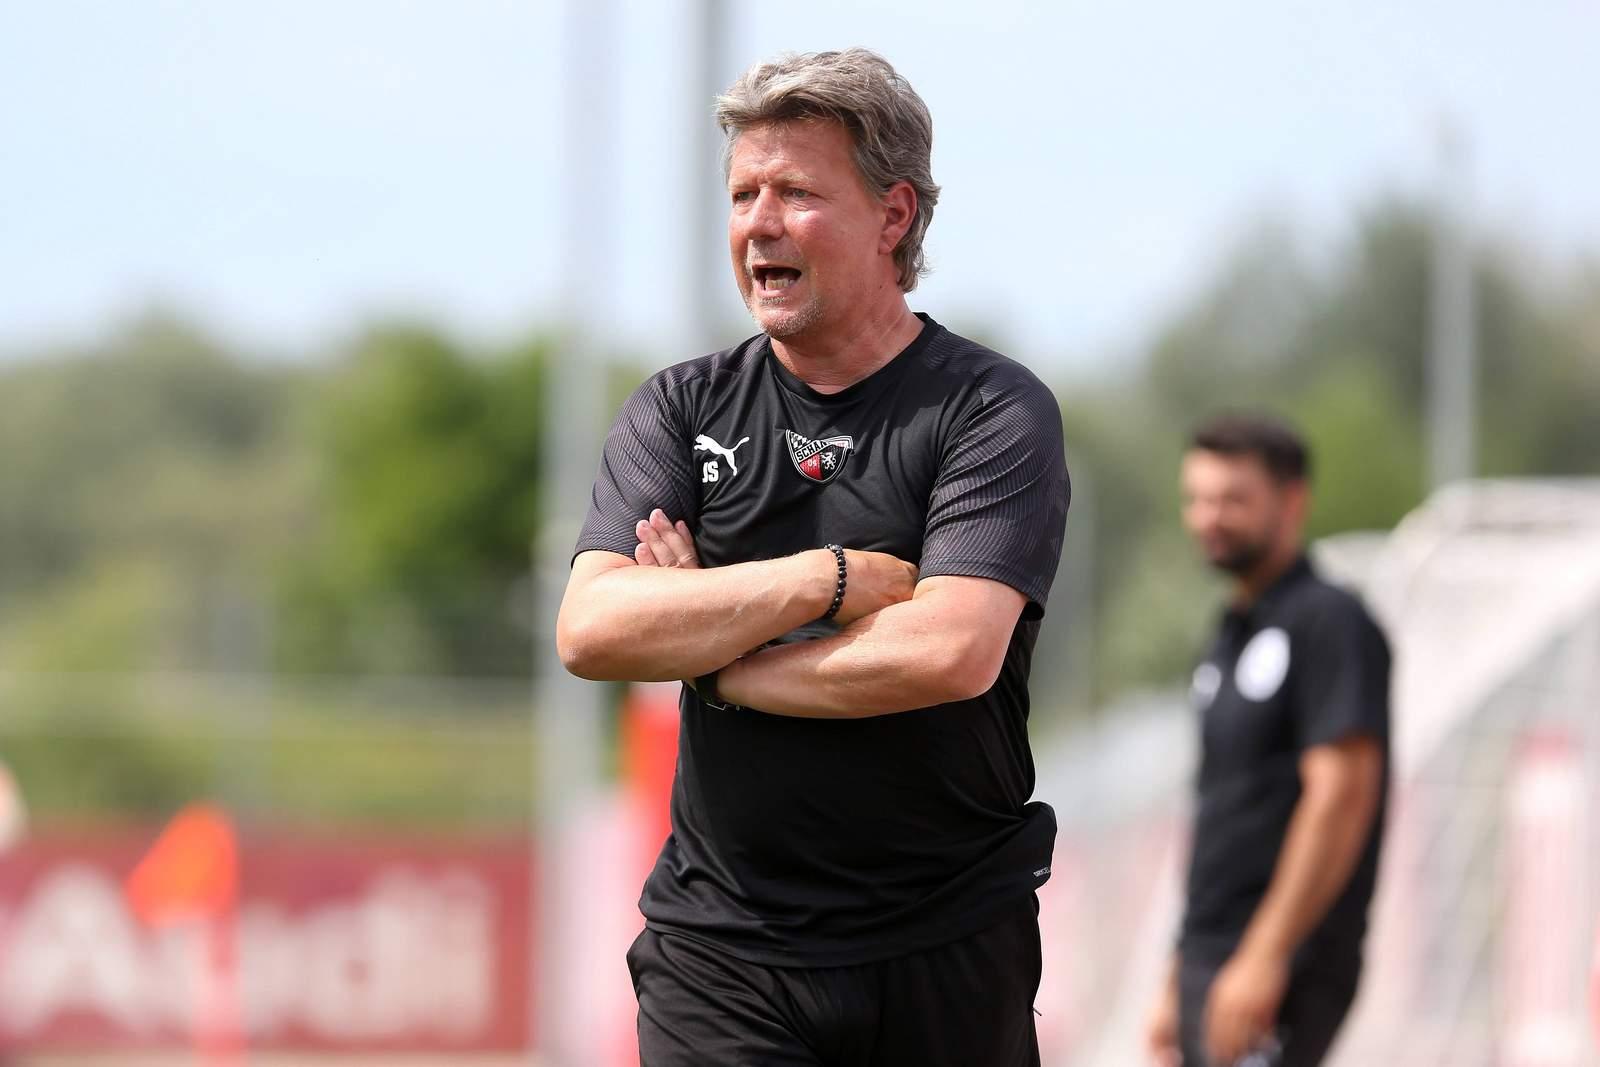 Jeff Saibene vom FC Ingolstadt